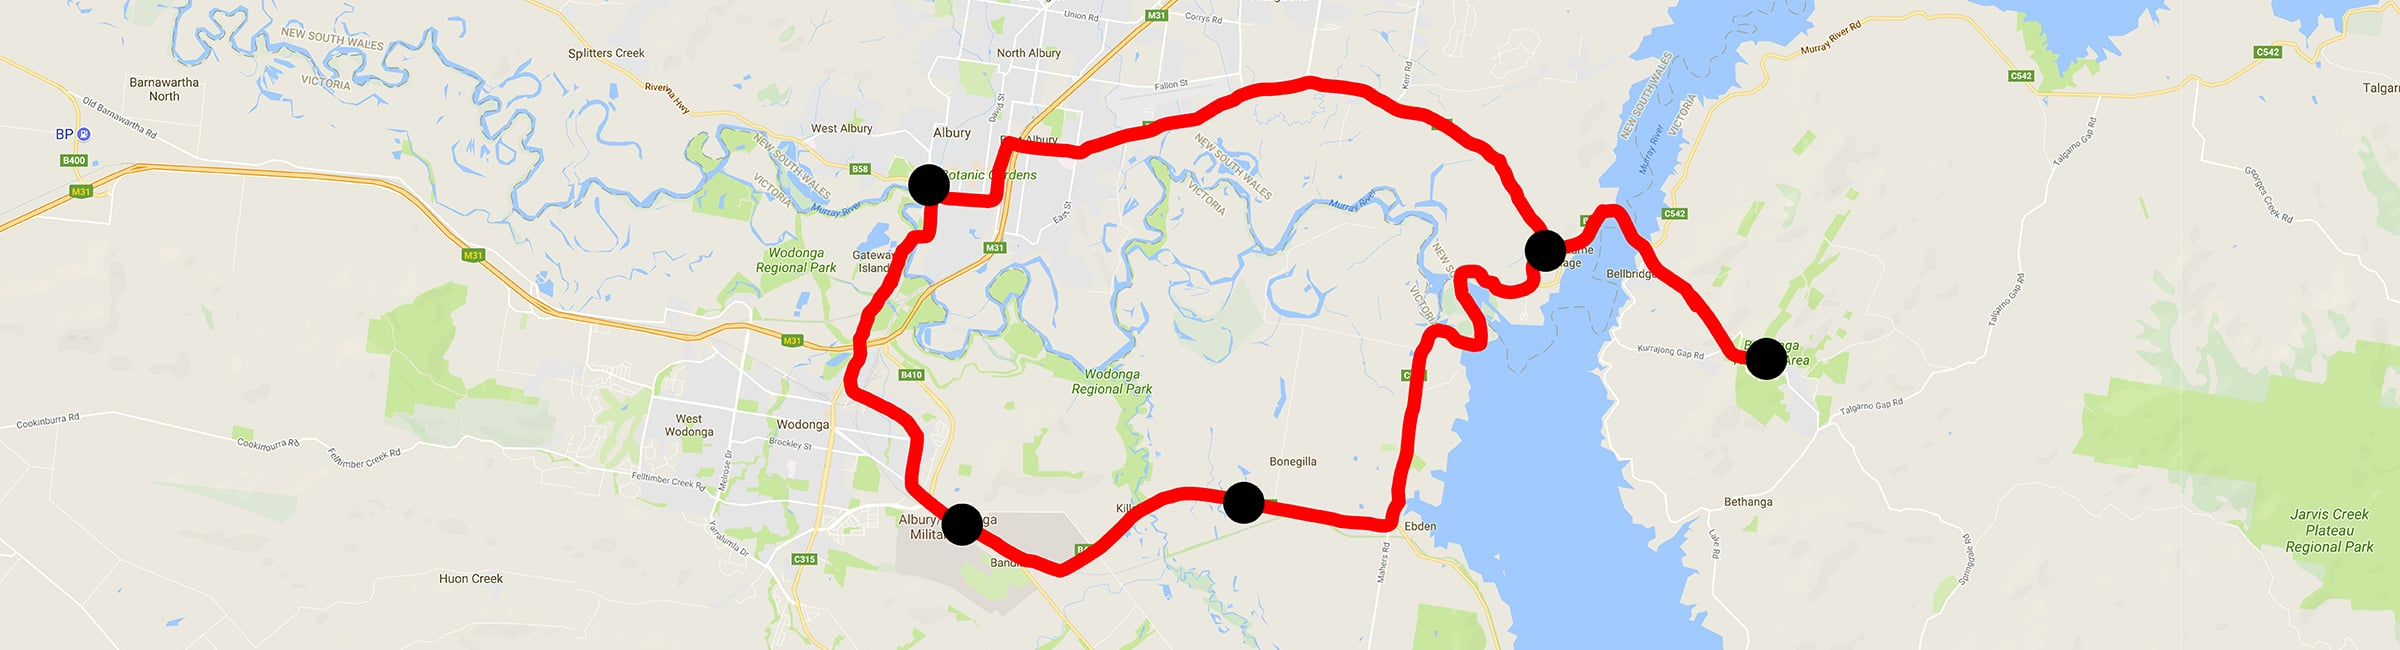 Day Trip - Lake Hume Loop - Albury Taxis